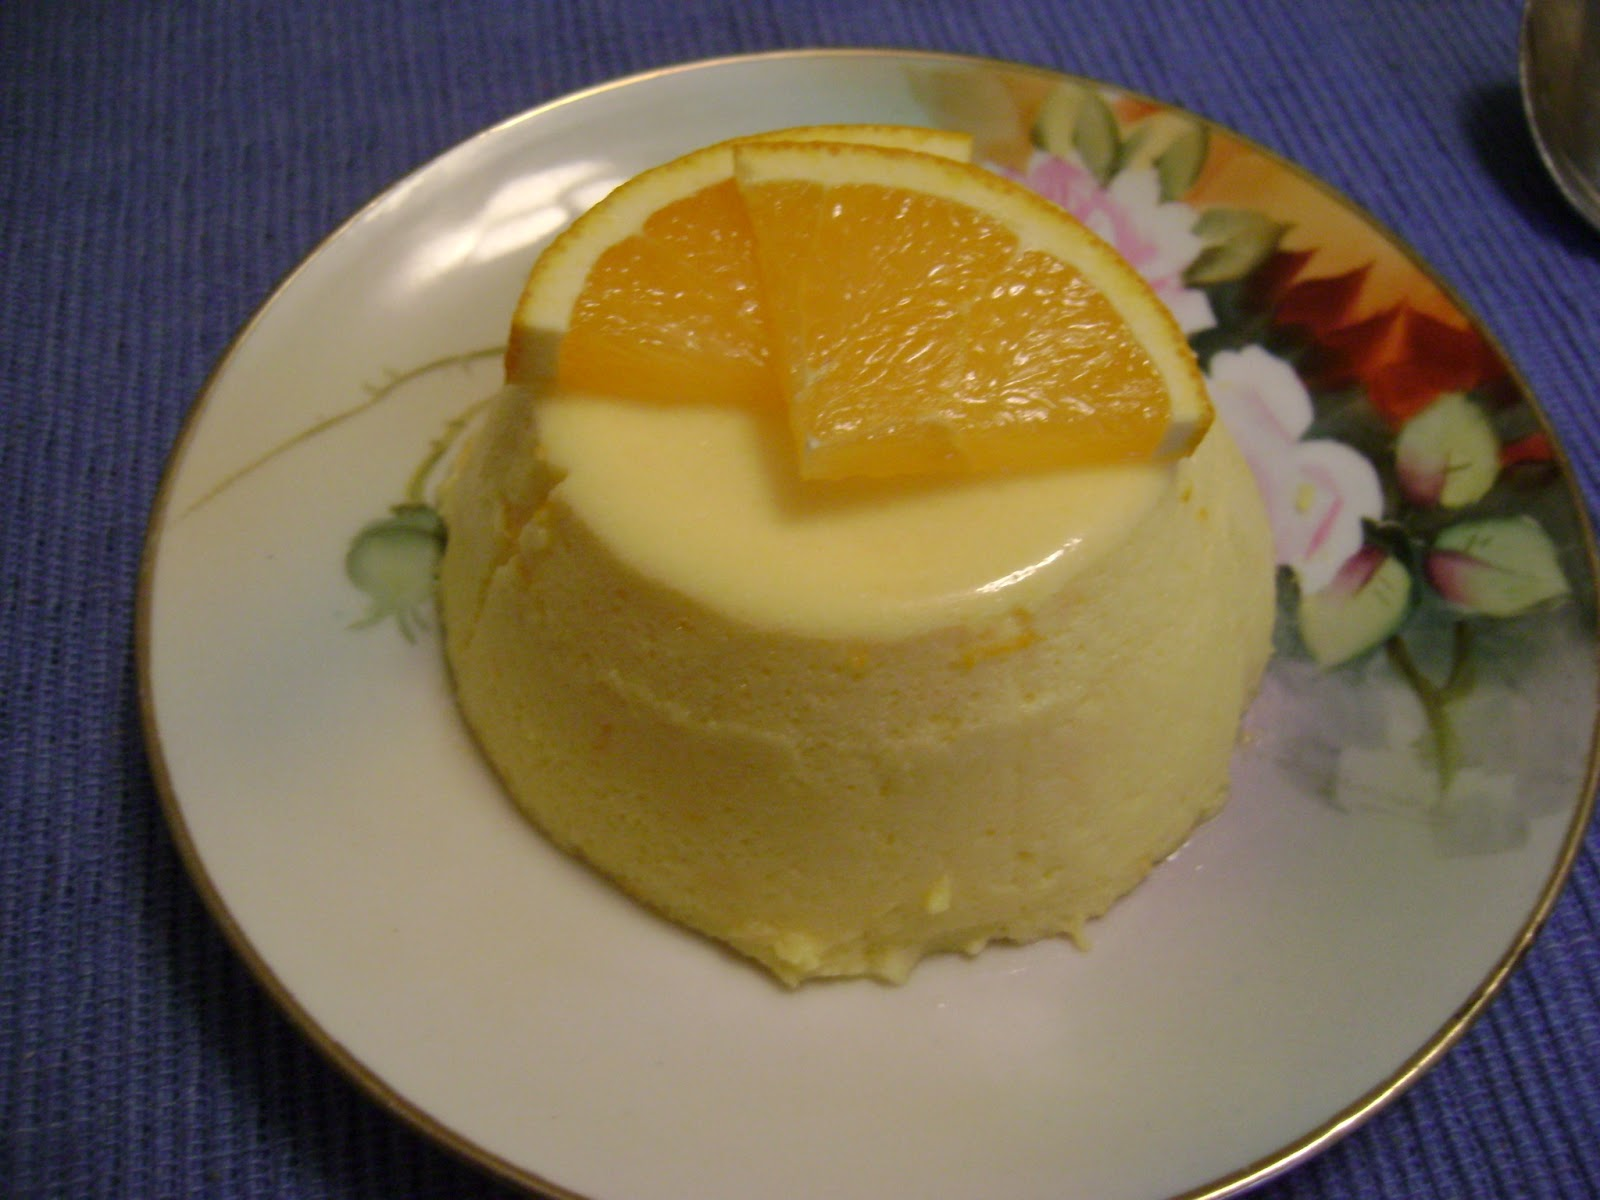 A Sunflower Life Orange Bavarian Cream Watermelon Wallpaper Rainbow Find Free HD for Desktop [freshlhys.tk]